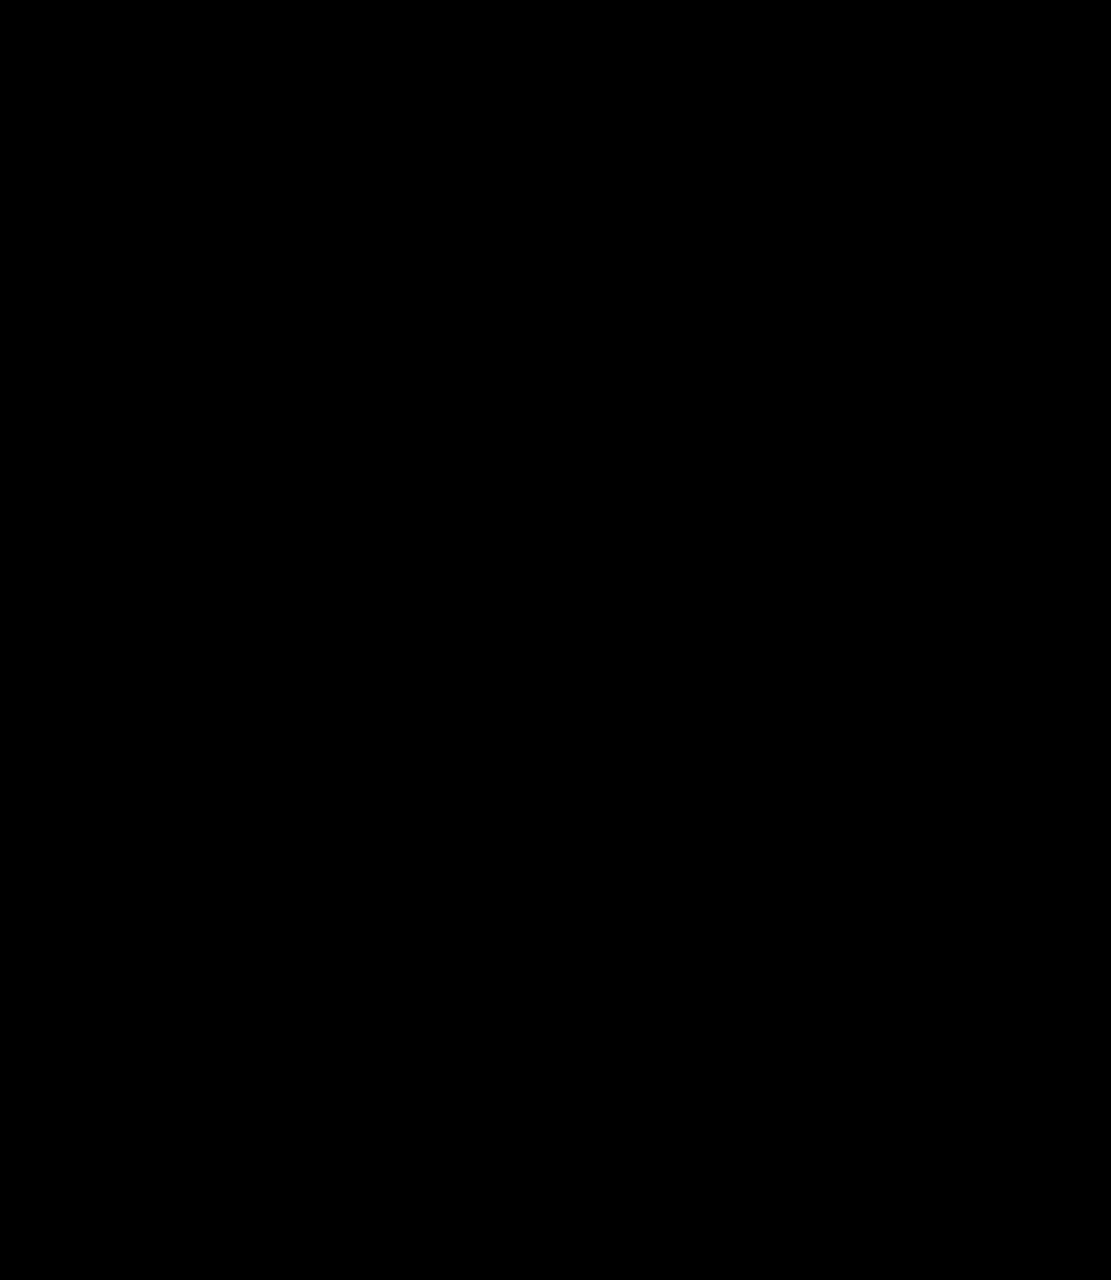 grim reaper outline